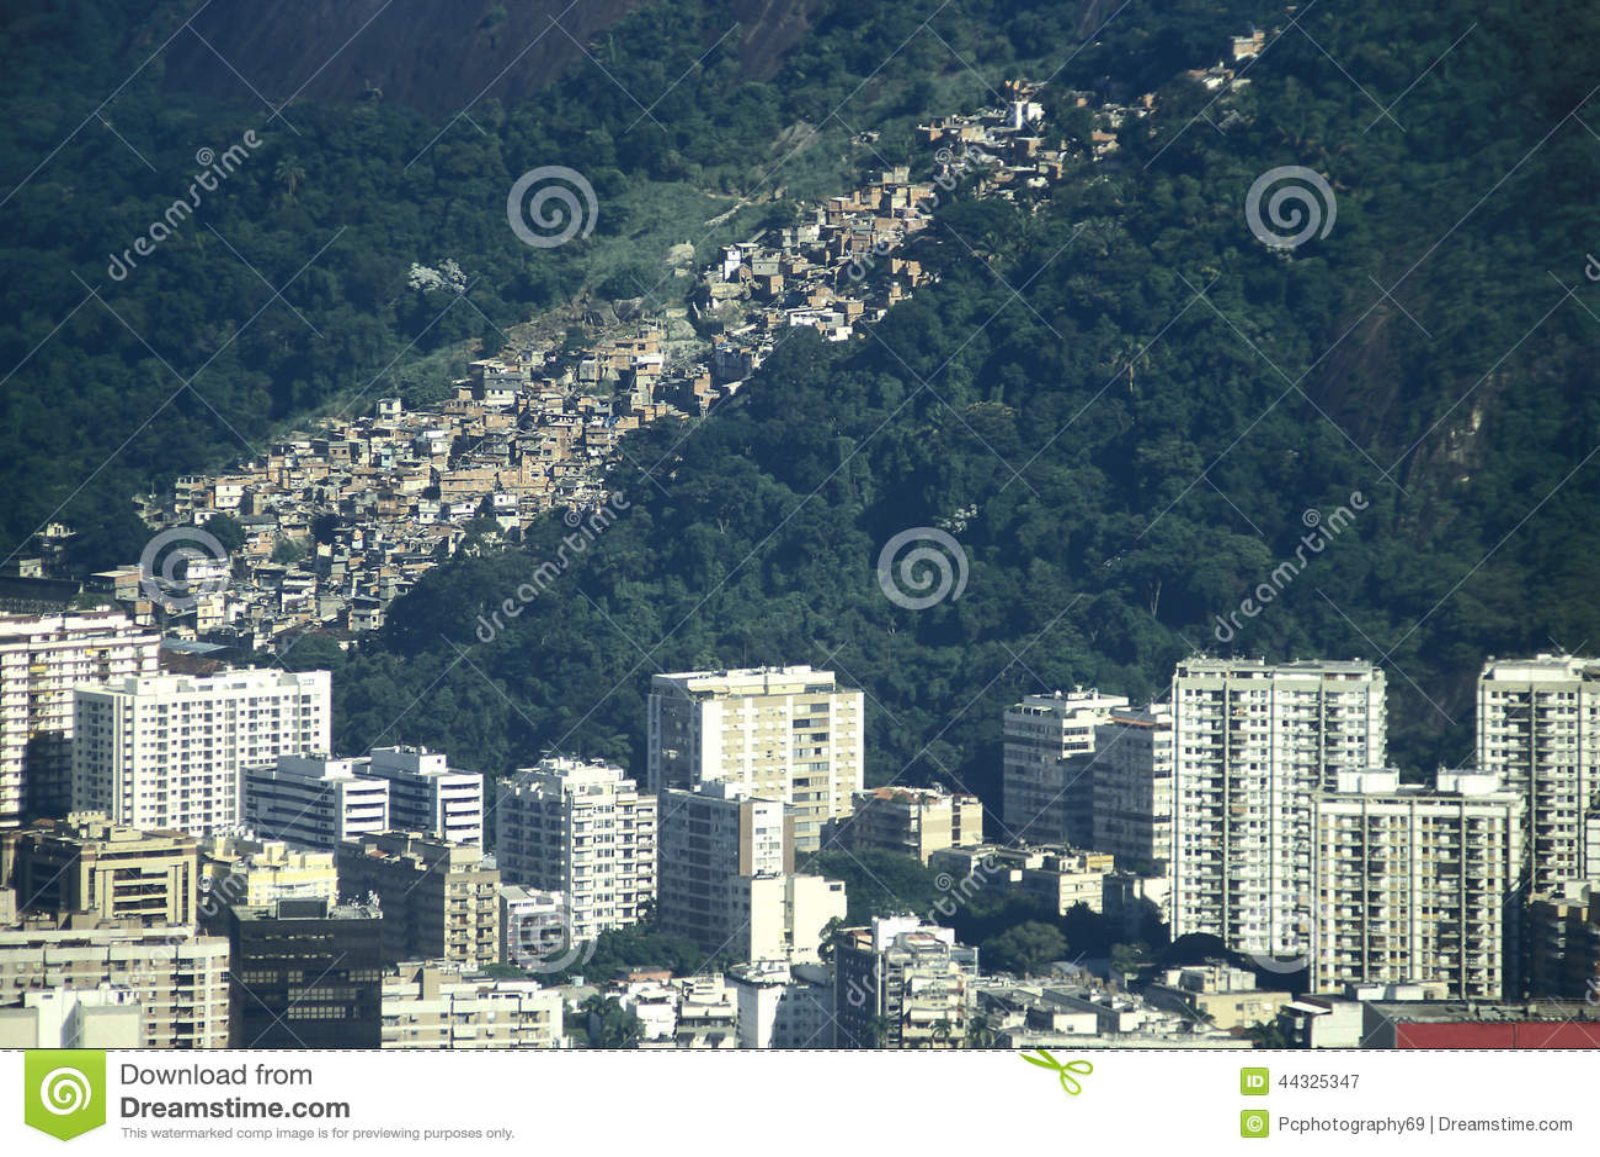 O contraste bewtween a riqueza e a pobreza em Brasil: arranha-céus